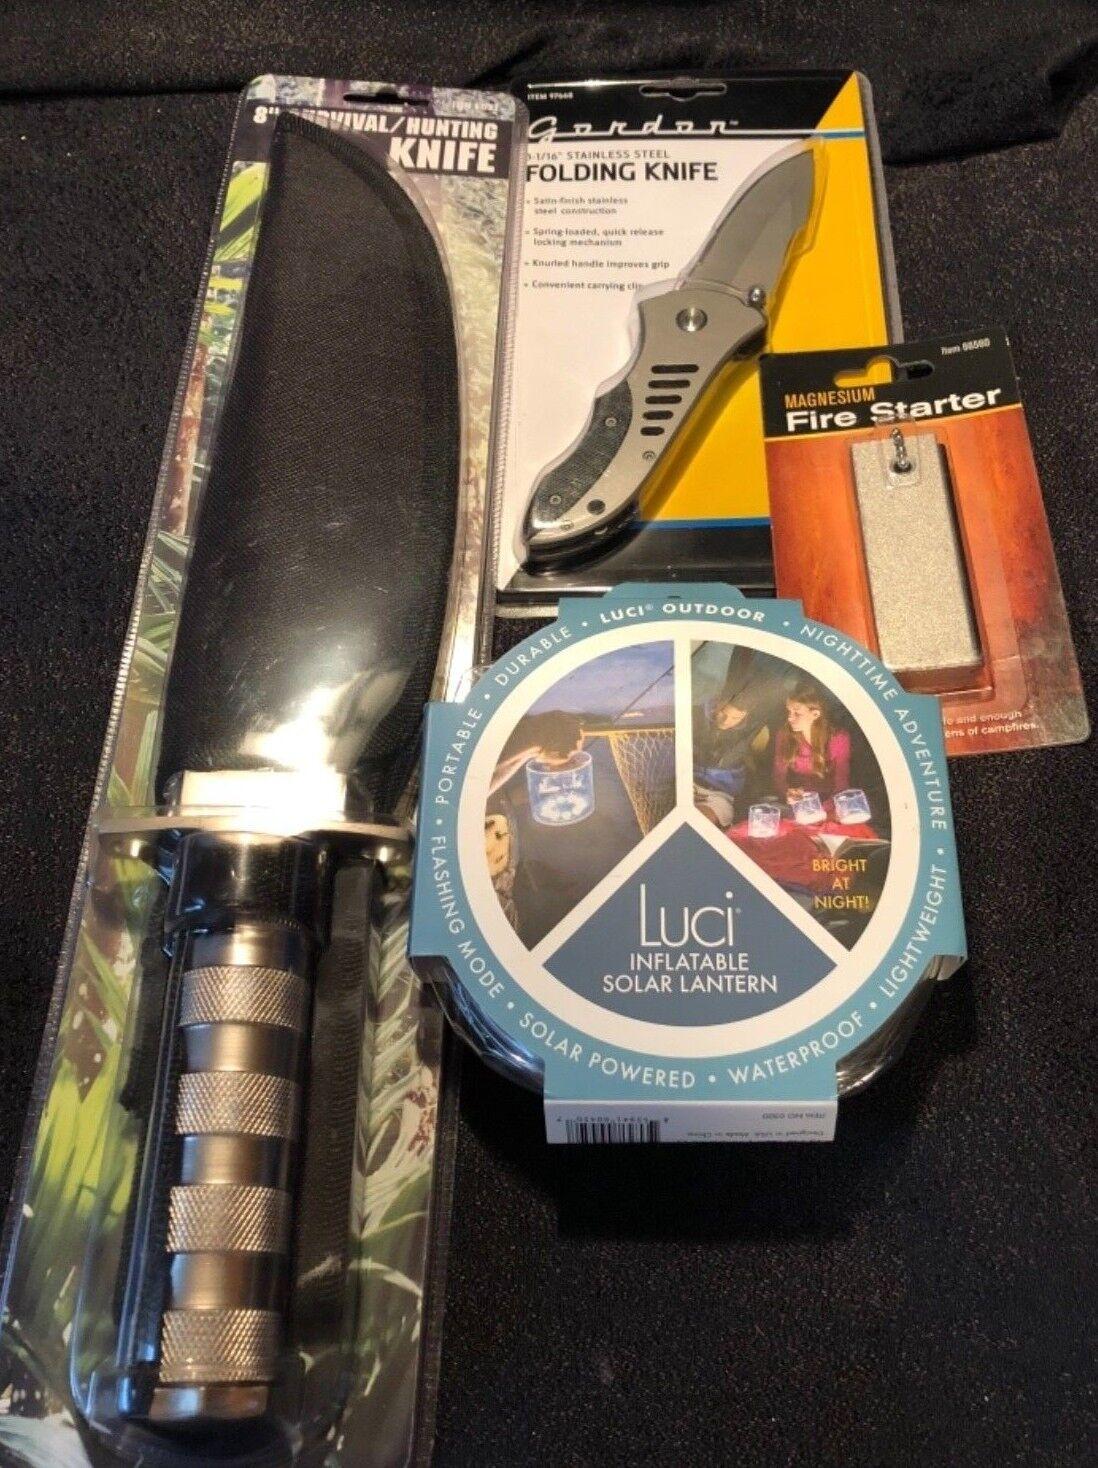 NEW Survival Hunting Knife-Folding Knife-Inflatable Sonar Lantern-Firestarter